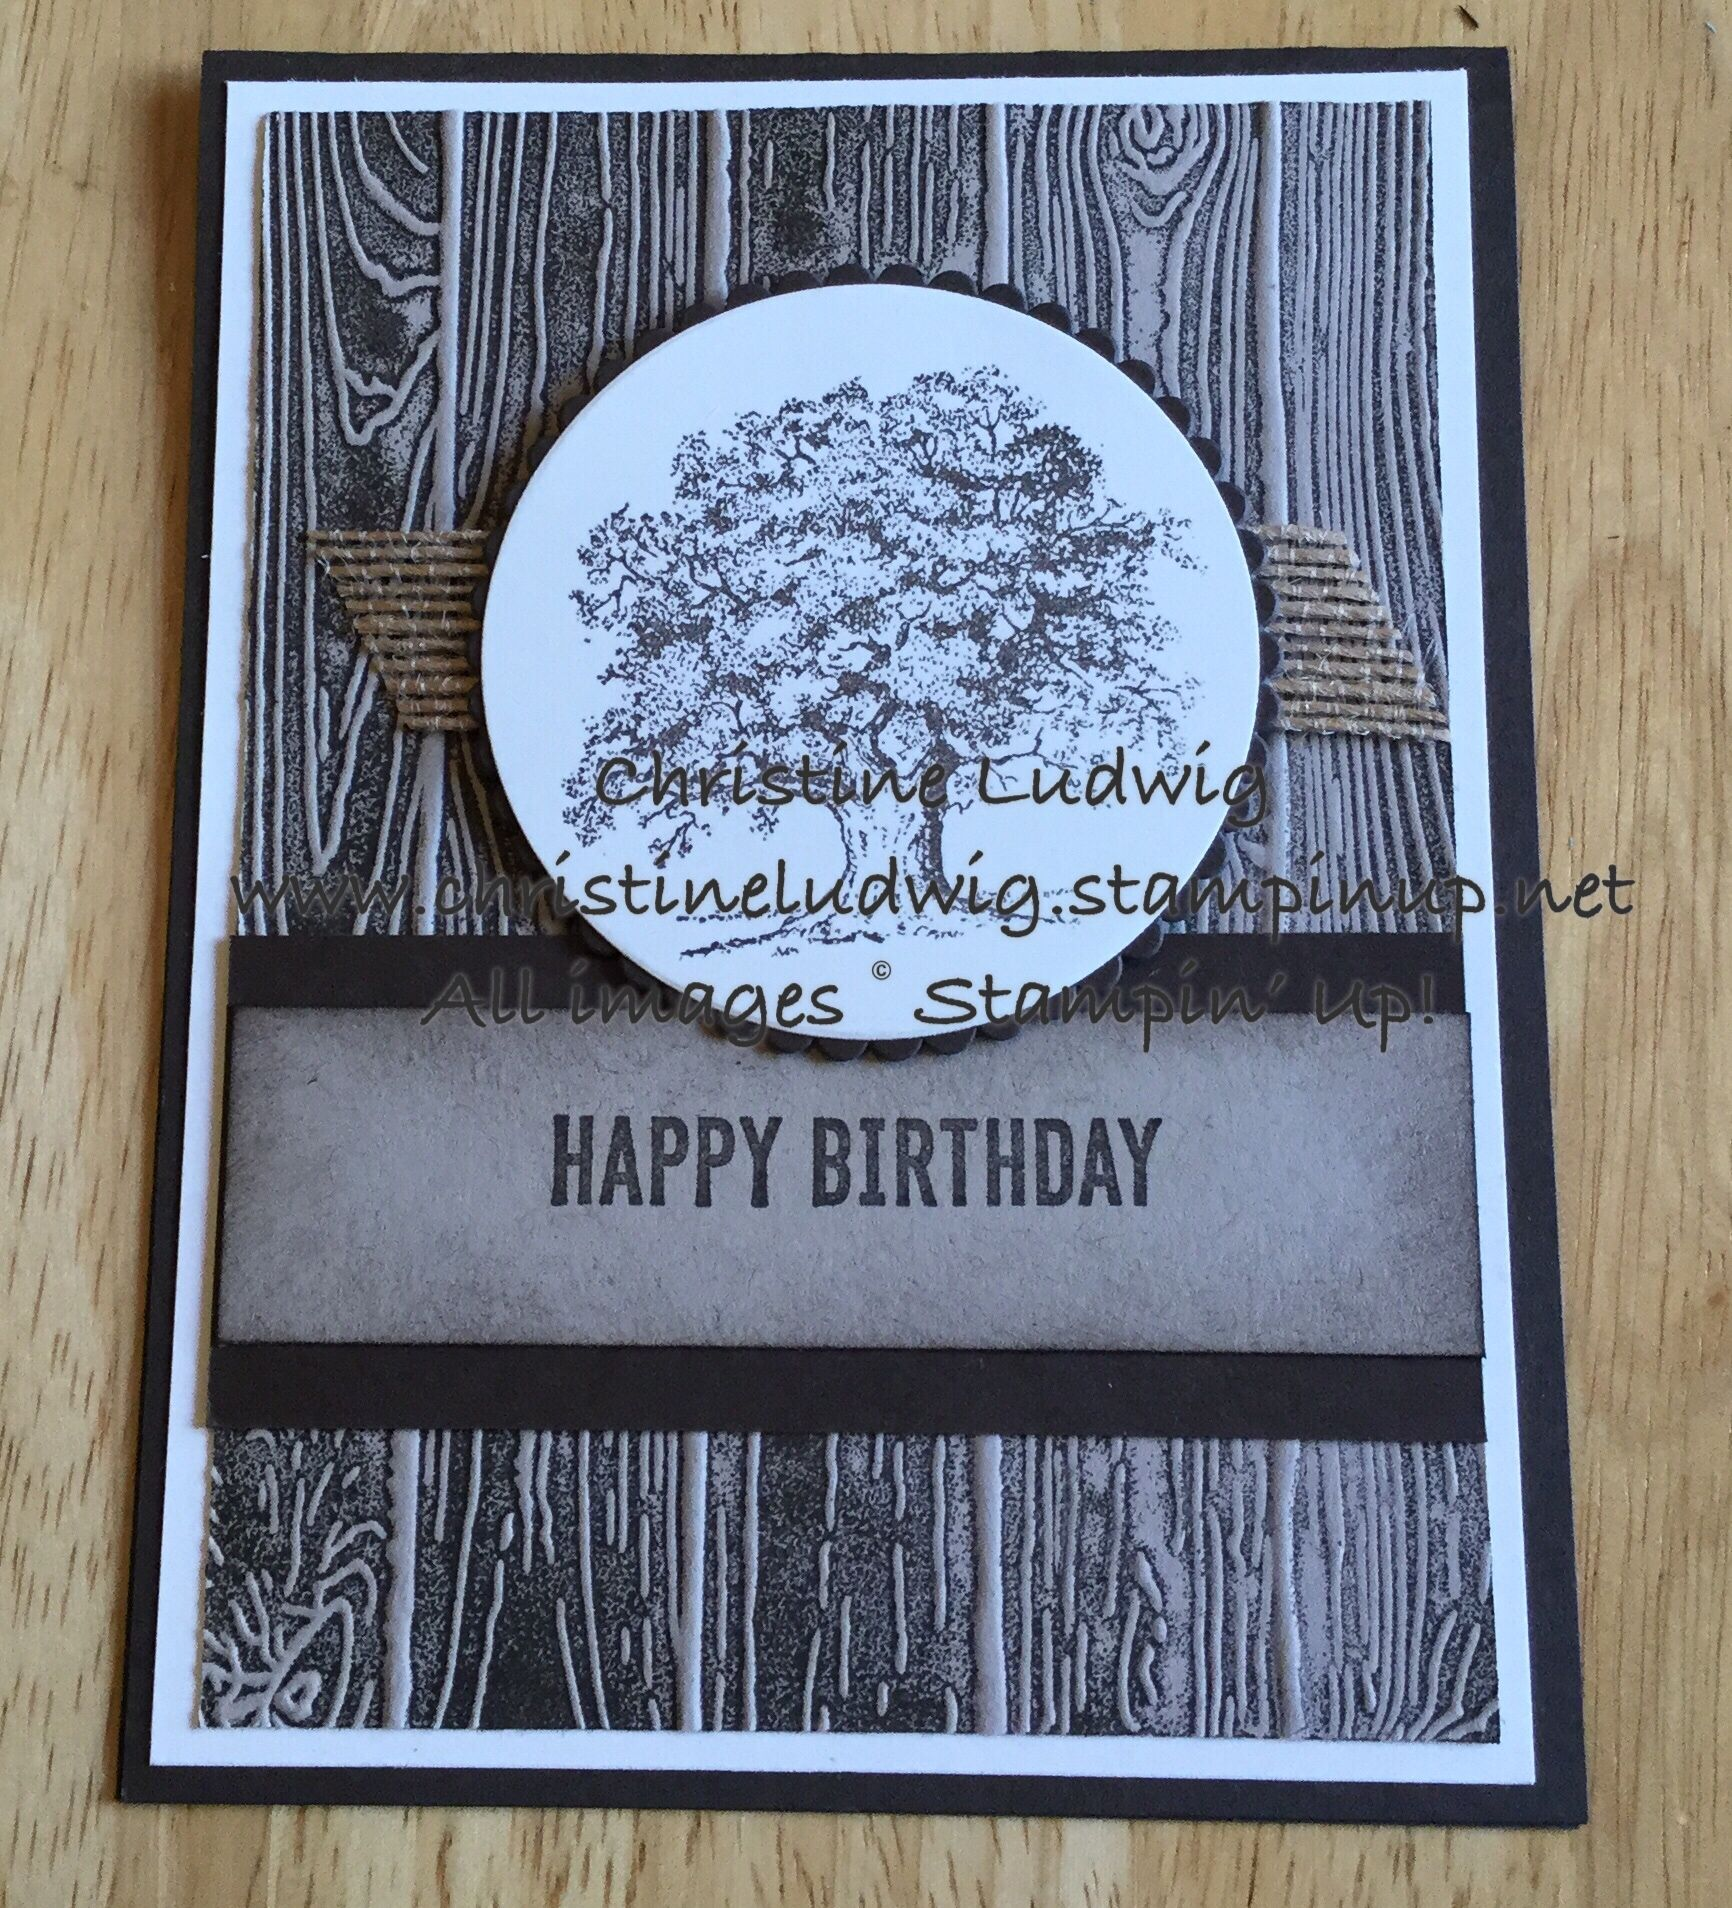 Crafting Newborn Baby Poem Wood Backed Rubber Stamp Cardmaking Scrapbooking.